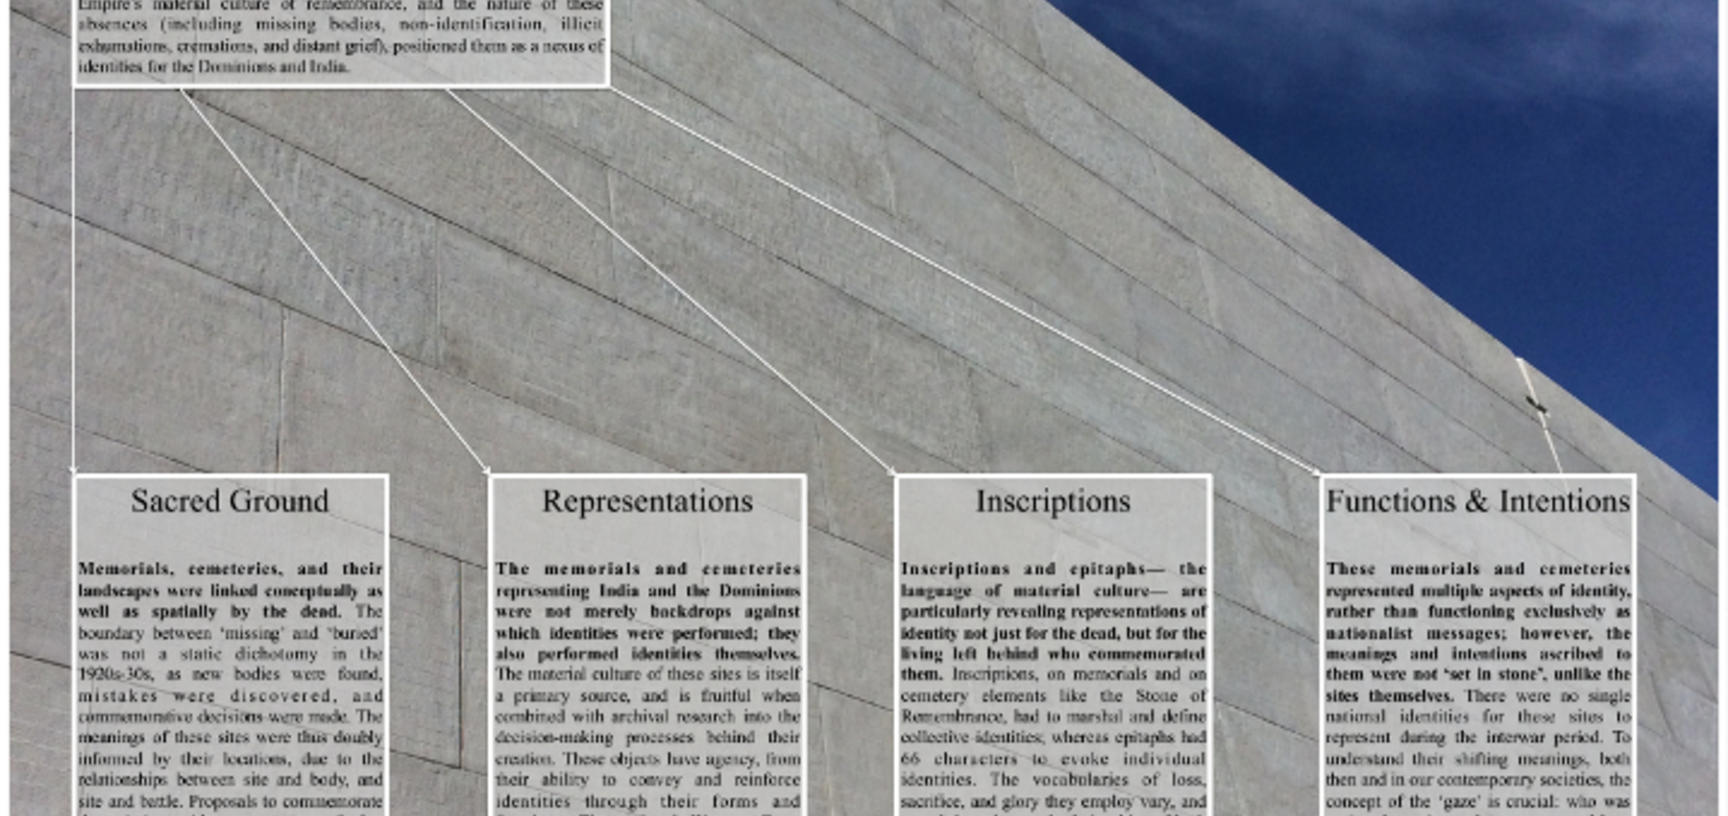 2017 poster material culture hanna smyth